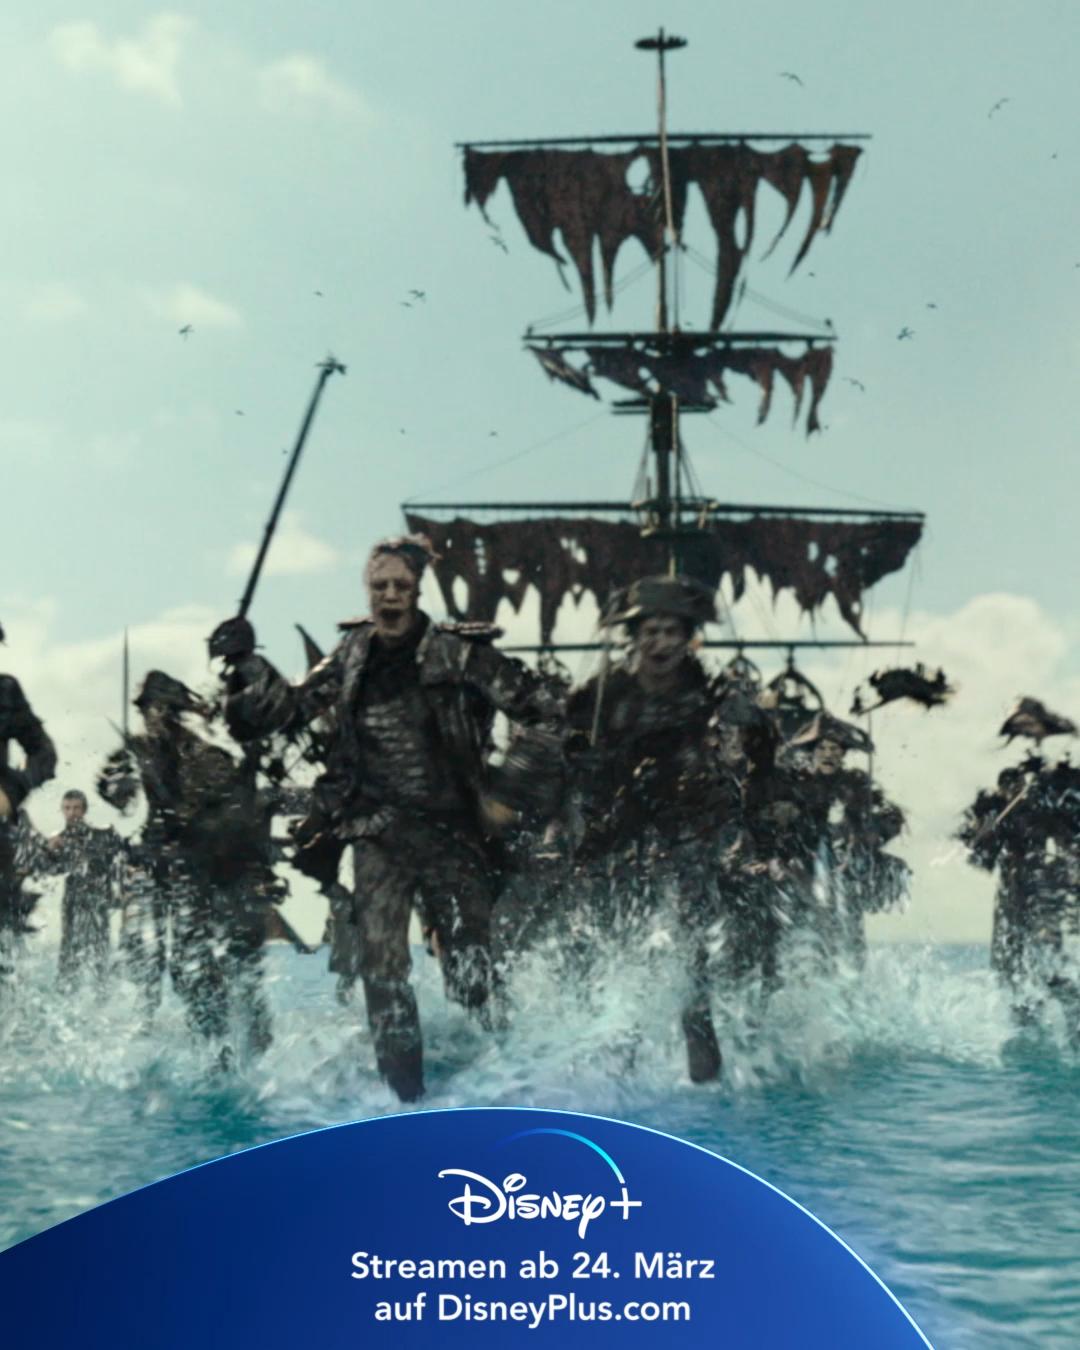 Streamen auf Disney+ #golfhumor